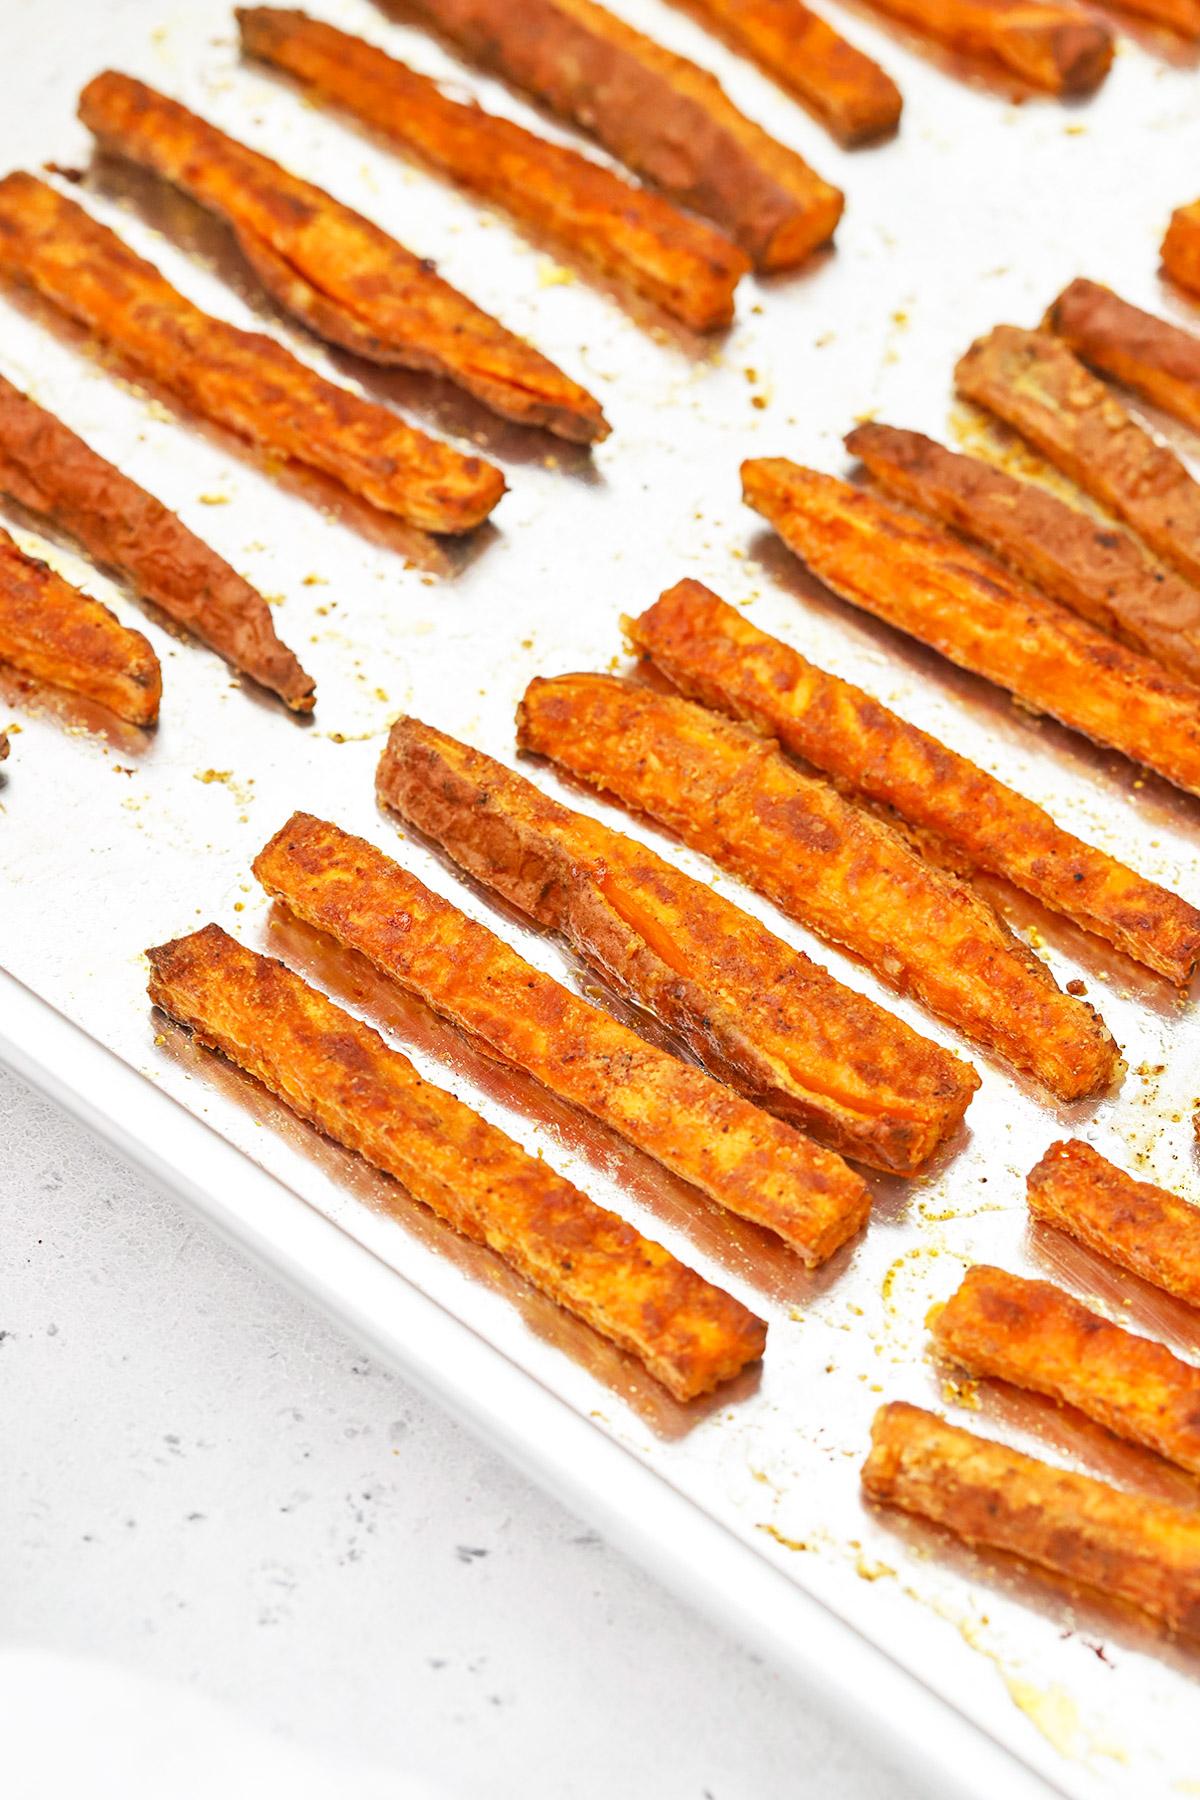 Crispy Baked Sweet Potato Fries with Fry Seasoning